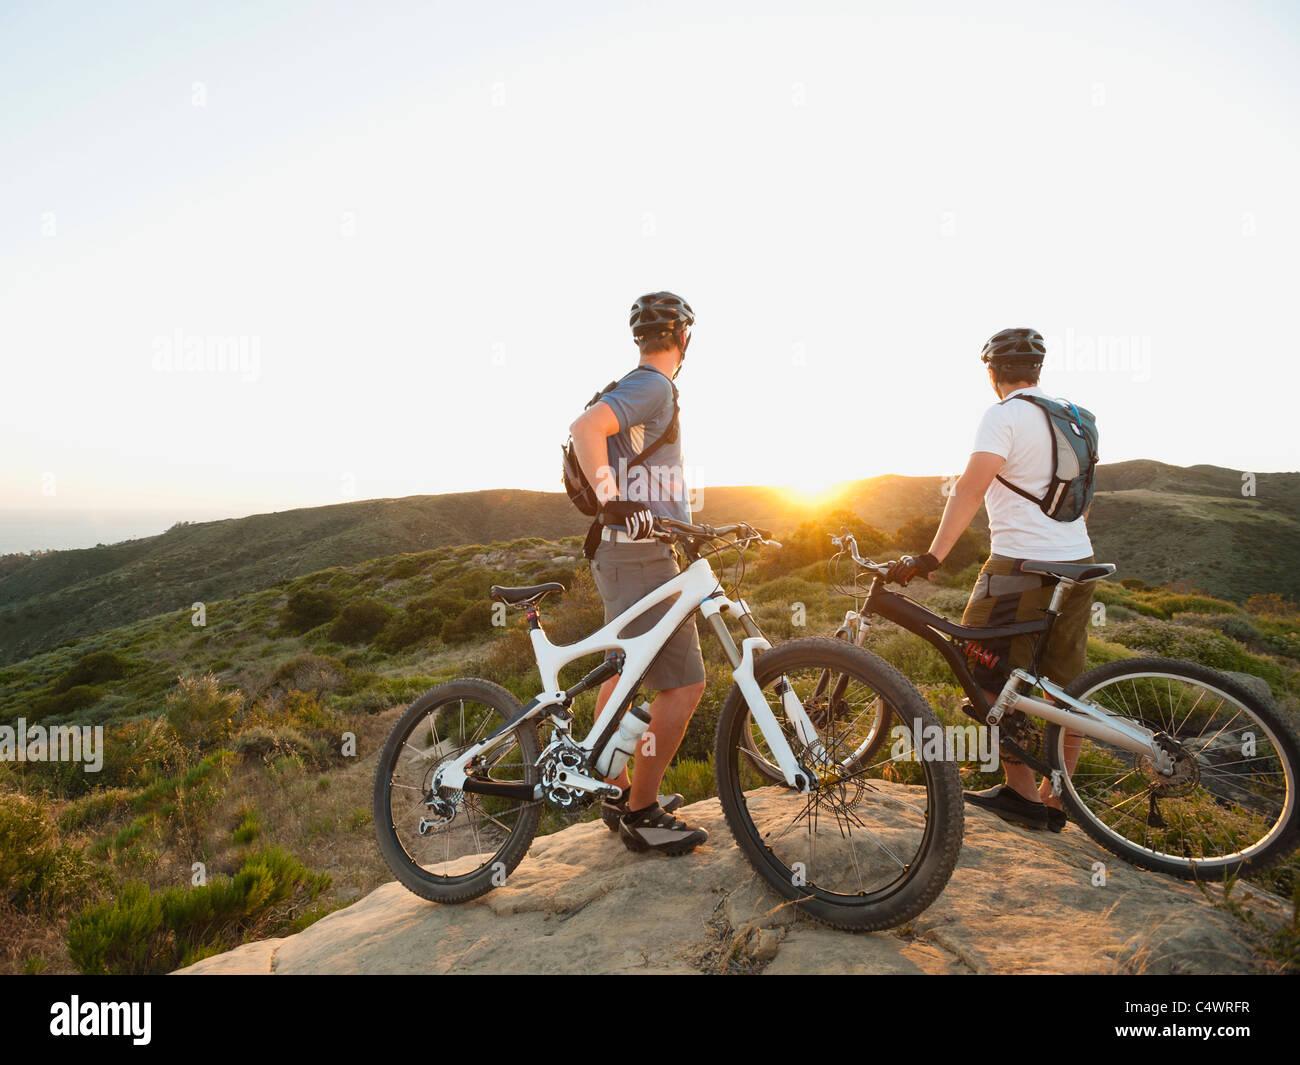 USA, California, Laguna Beach, zwei Biker am Hügel mit Blick auf den Blick Stockbild